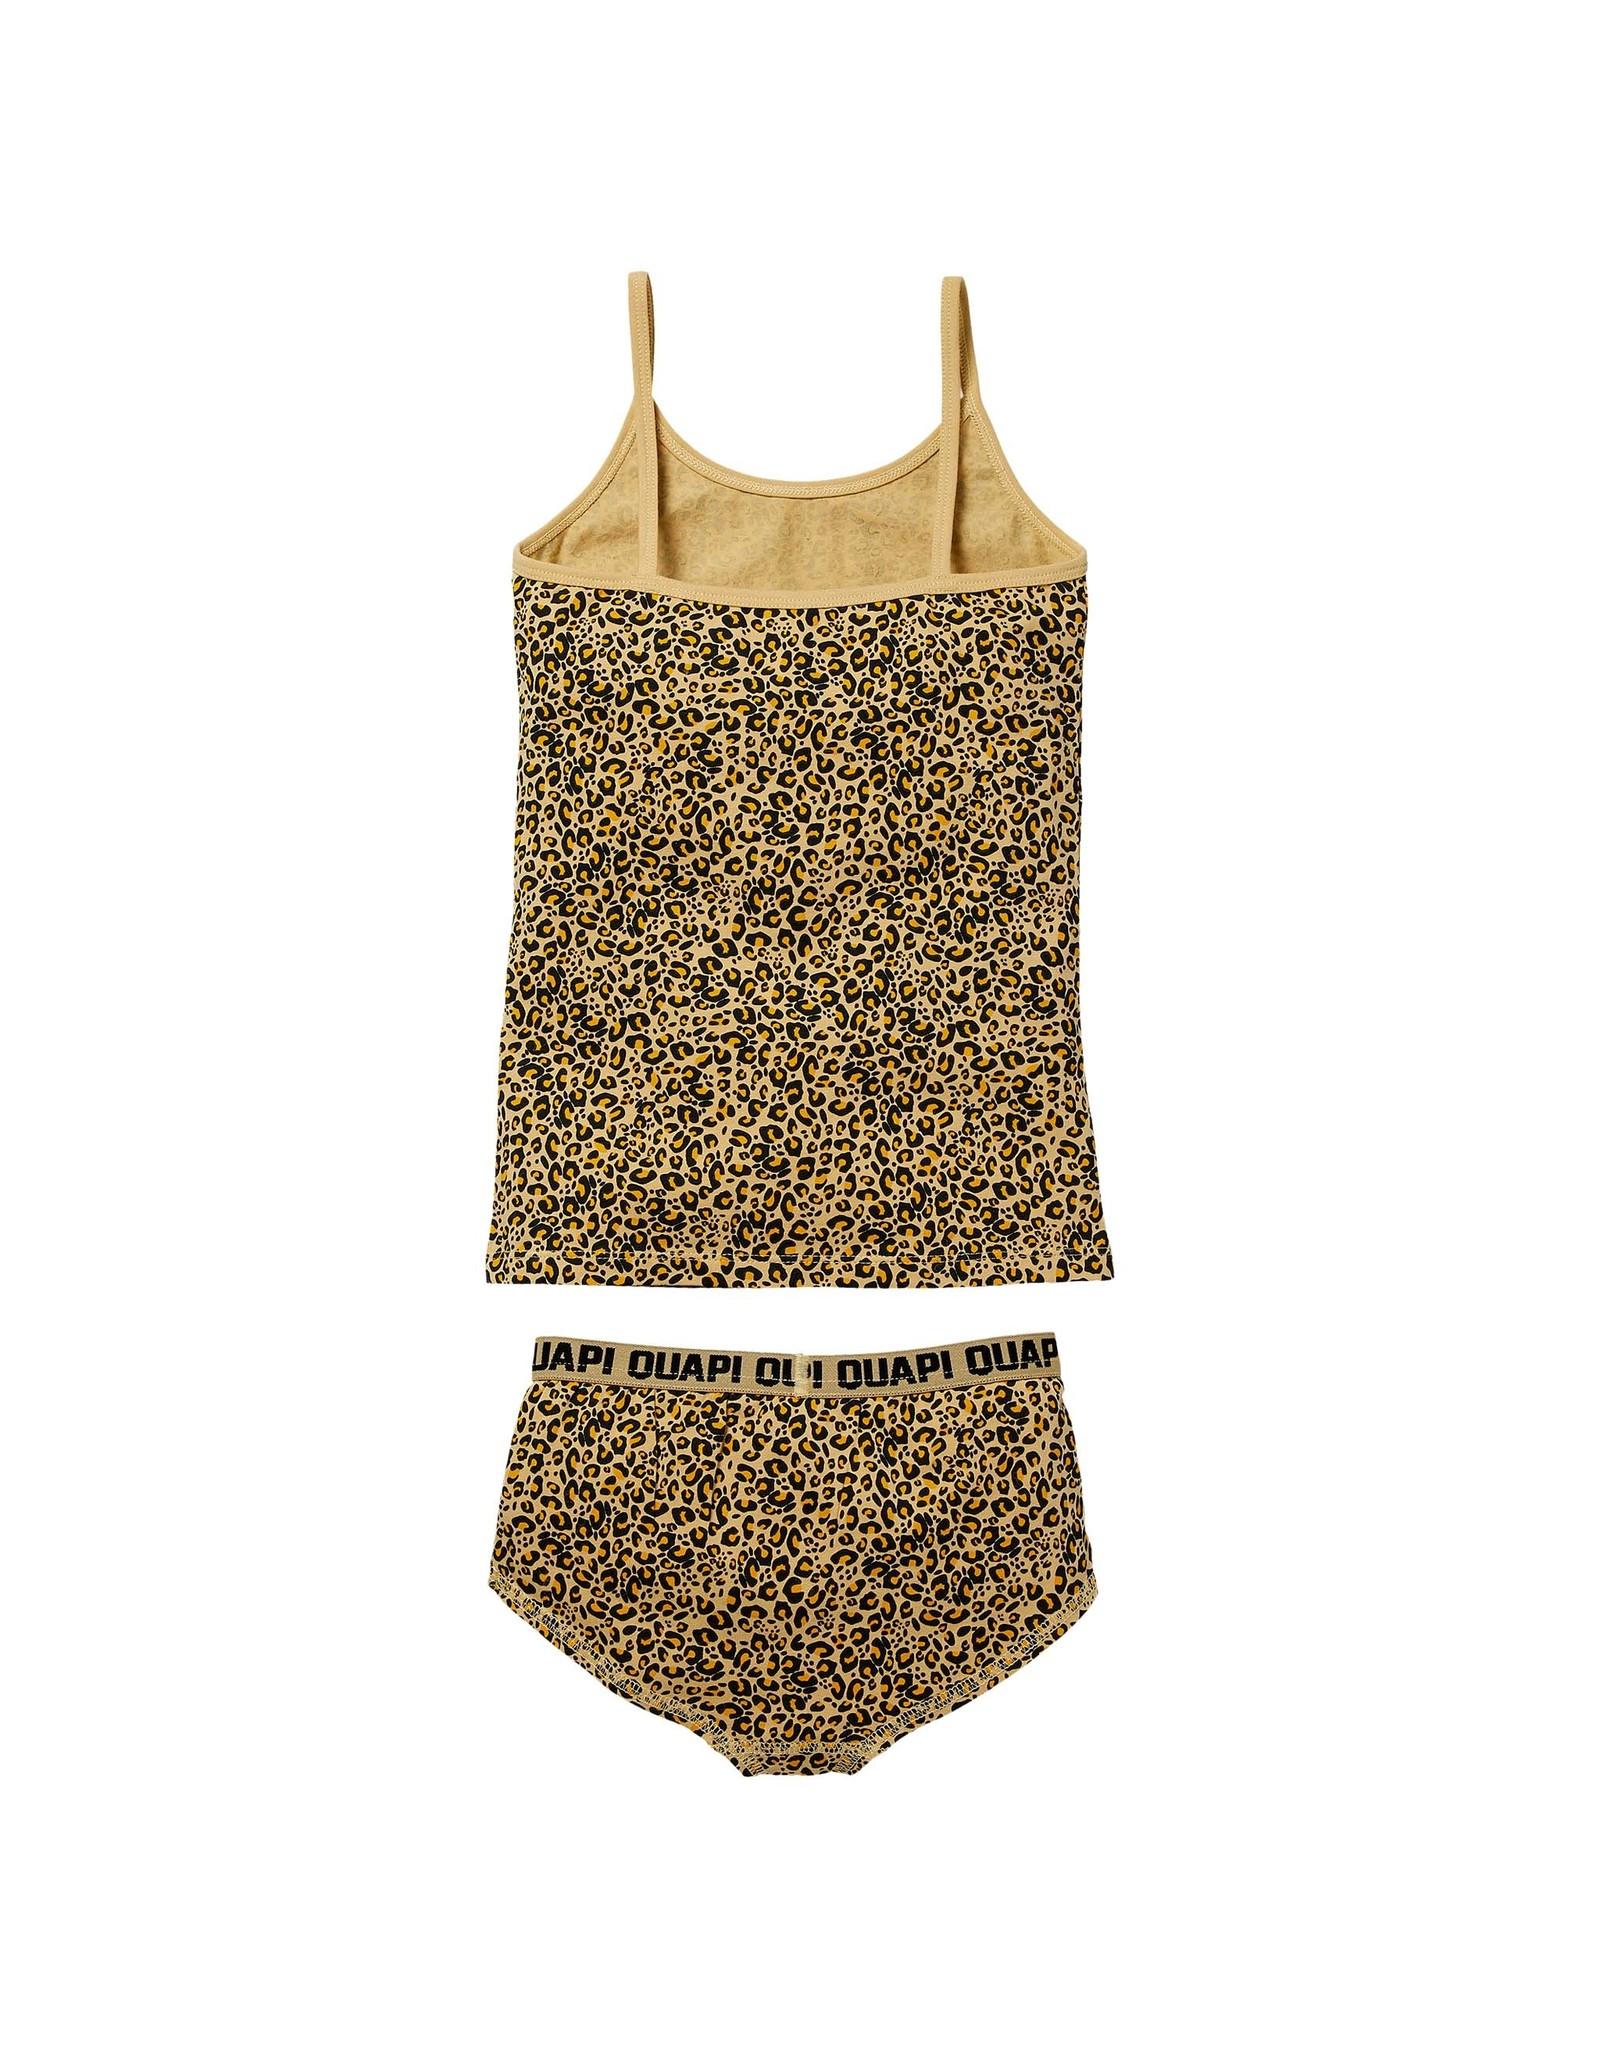 Quapi Quapi meisjes ondergoed setje Pip Sand Leopard aop